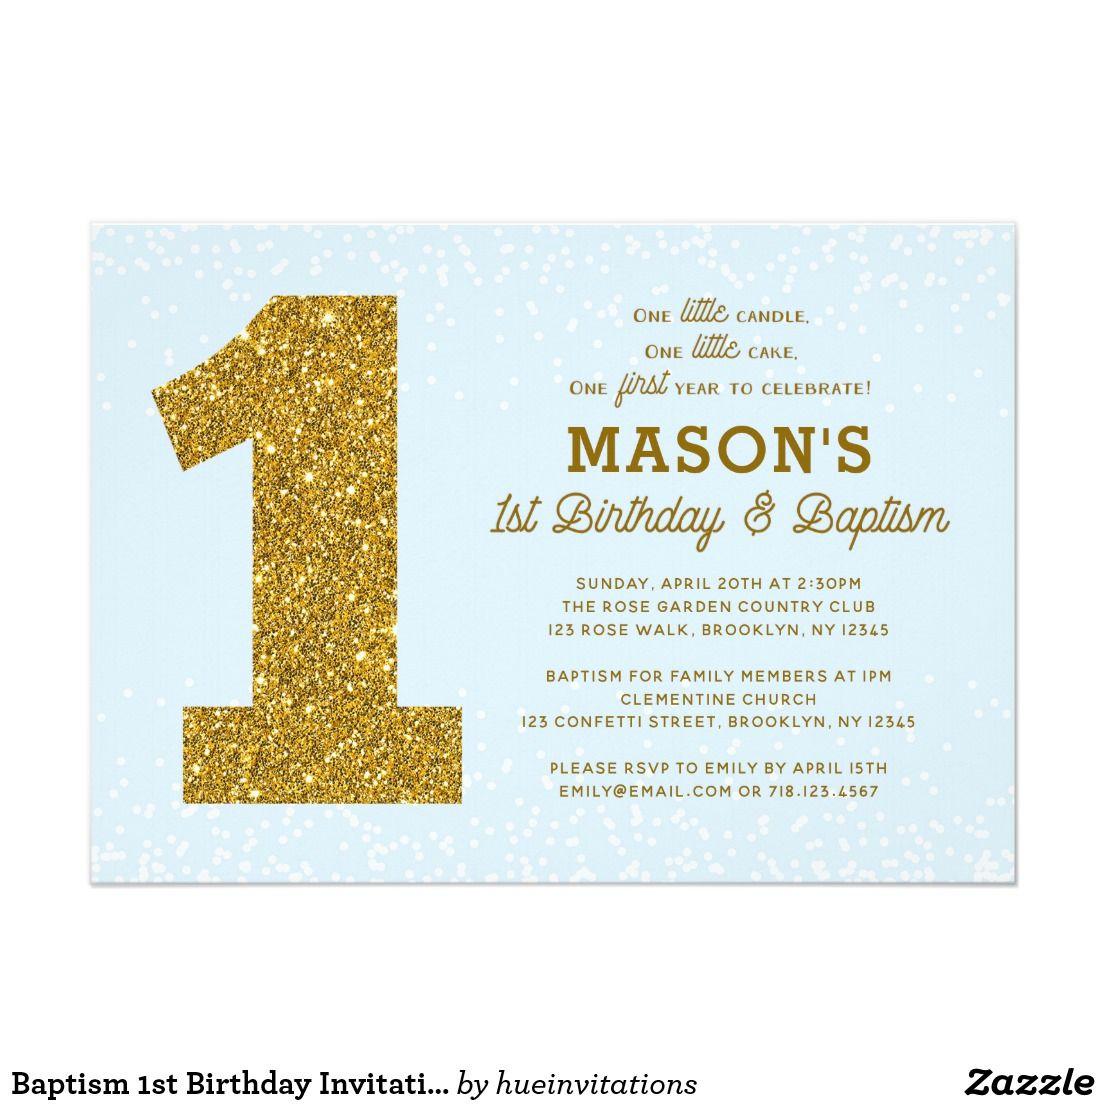 First Birthday And Baptism Invitations 1st Birthday And: Baptism 1st Birthday Invitation Blue Gold Boy